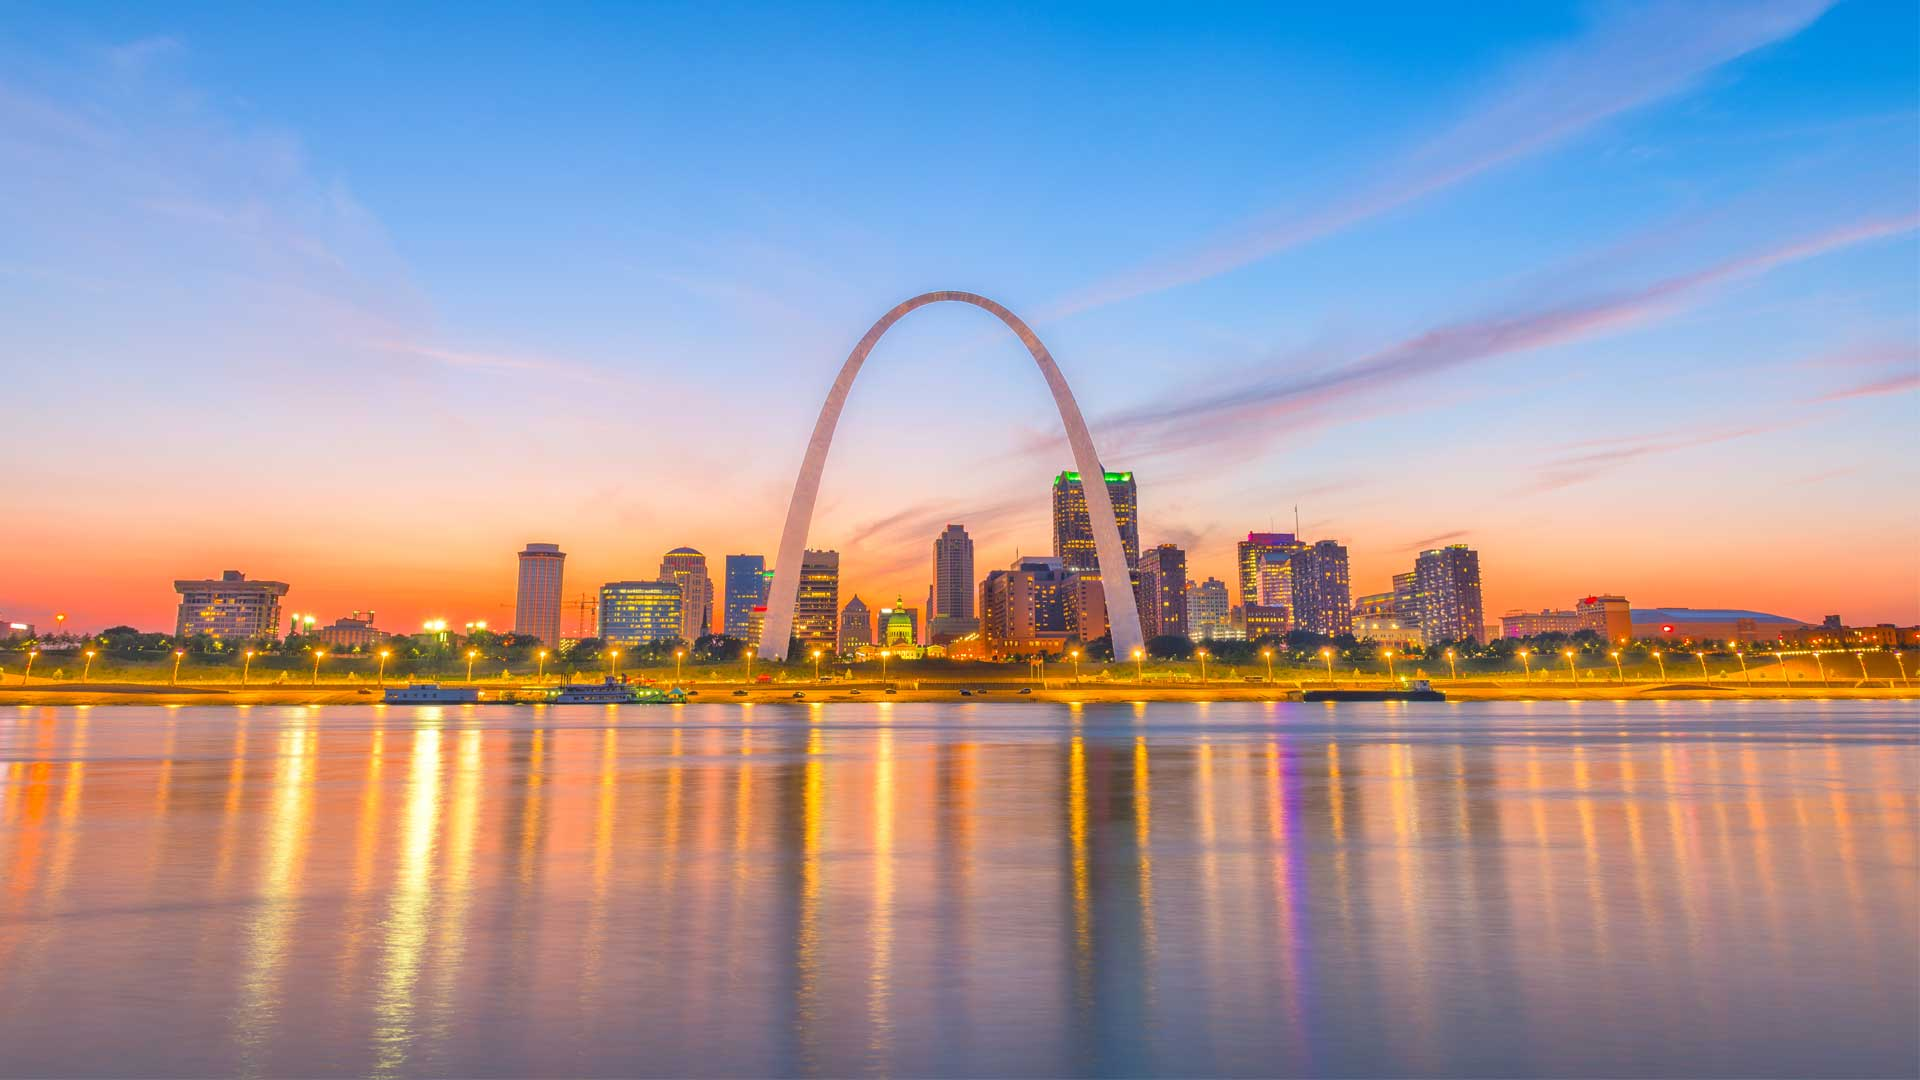 West St. Louis, MO #4753